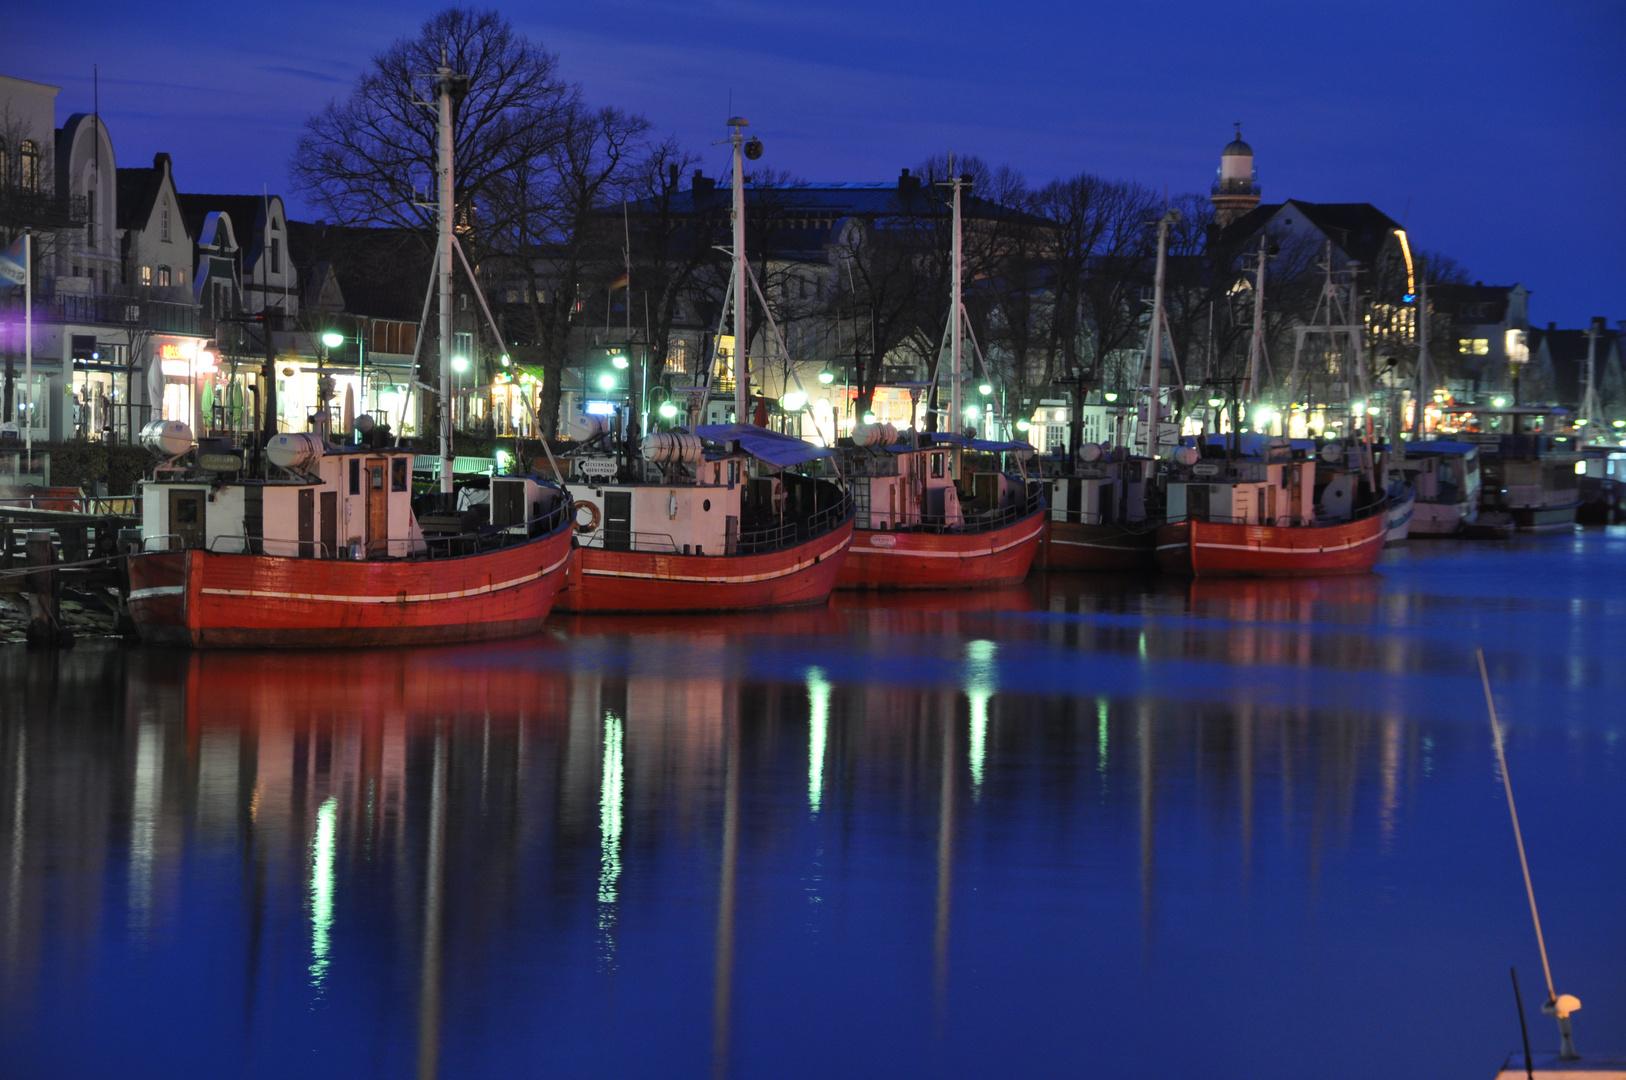 Rotes Boot, blaue Stunde